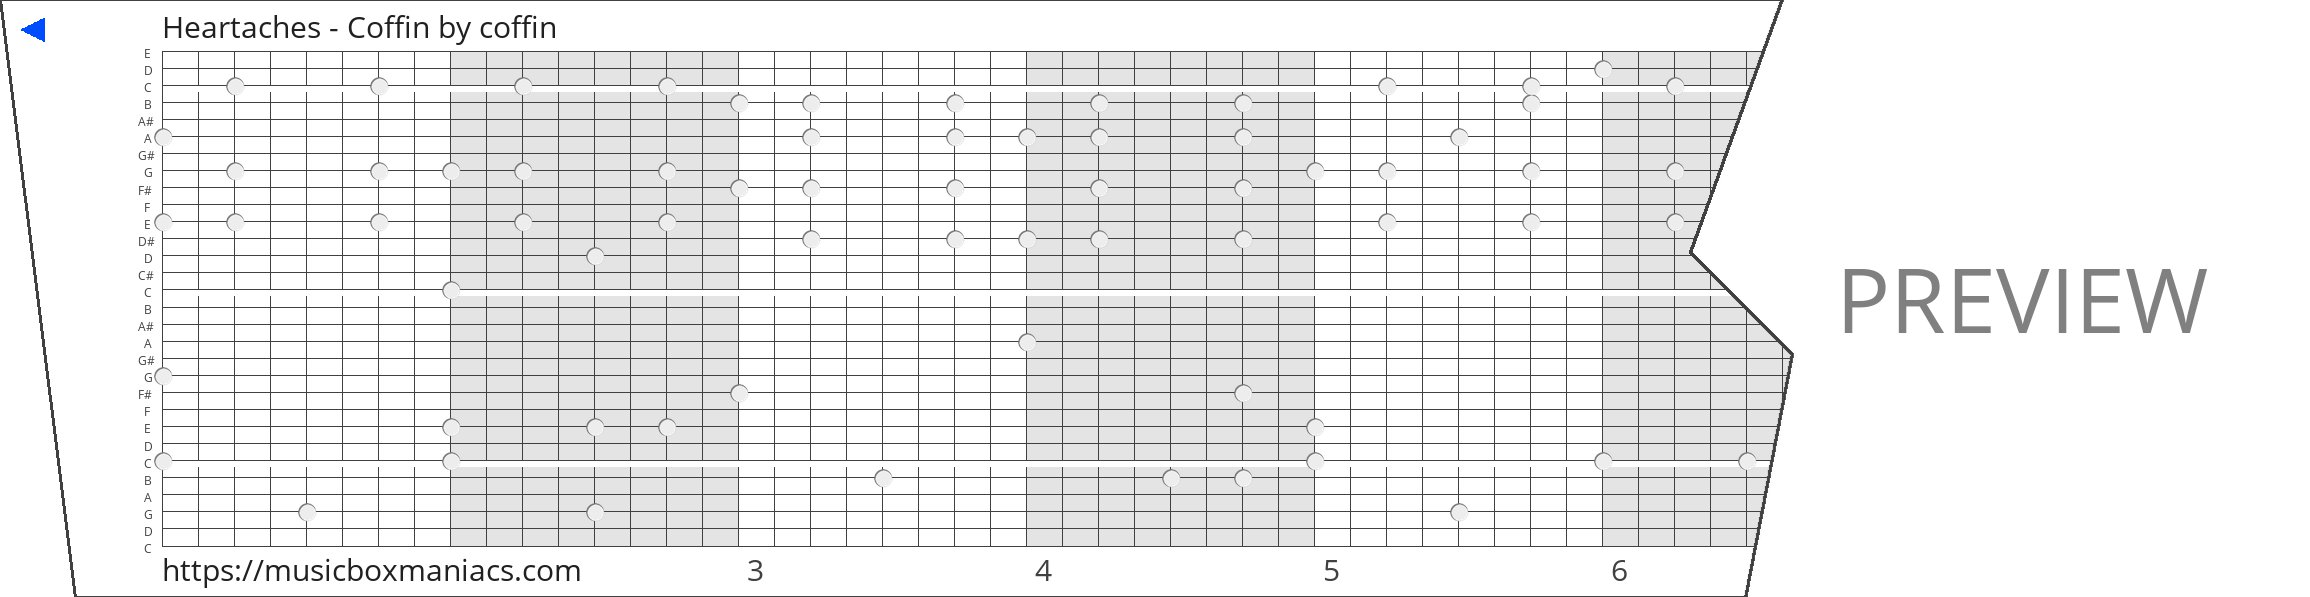 Heartaches - Coffin 30 note music box paper strip